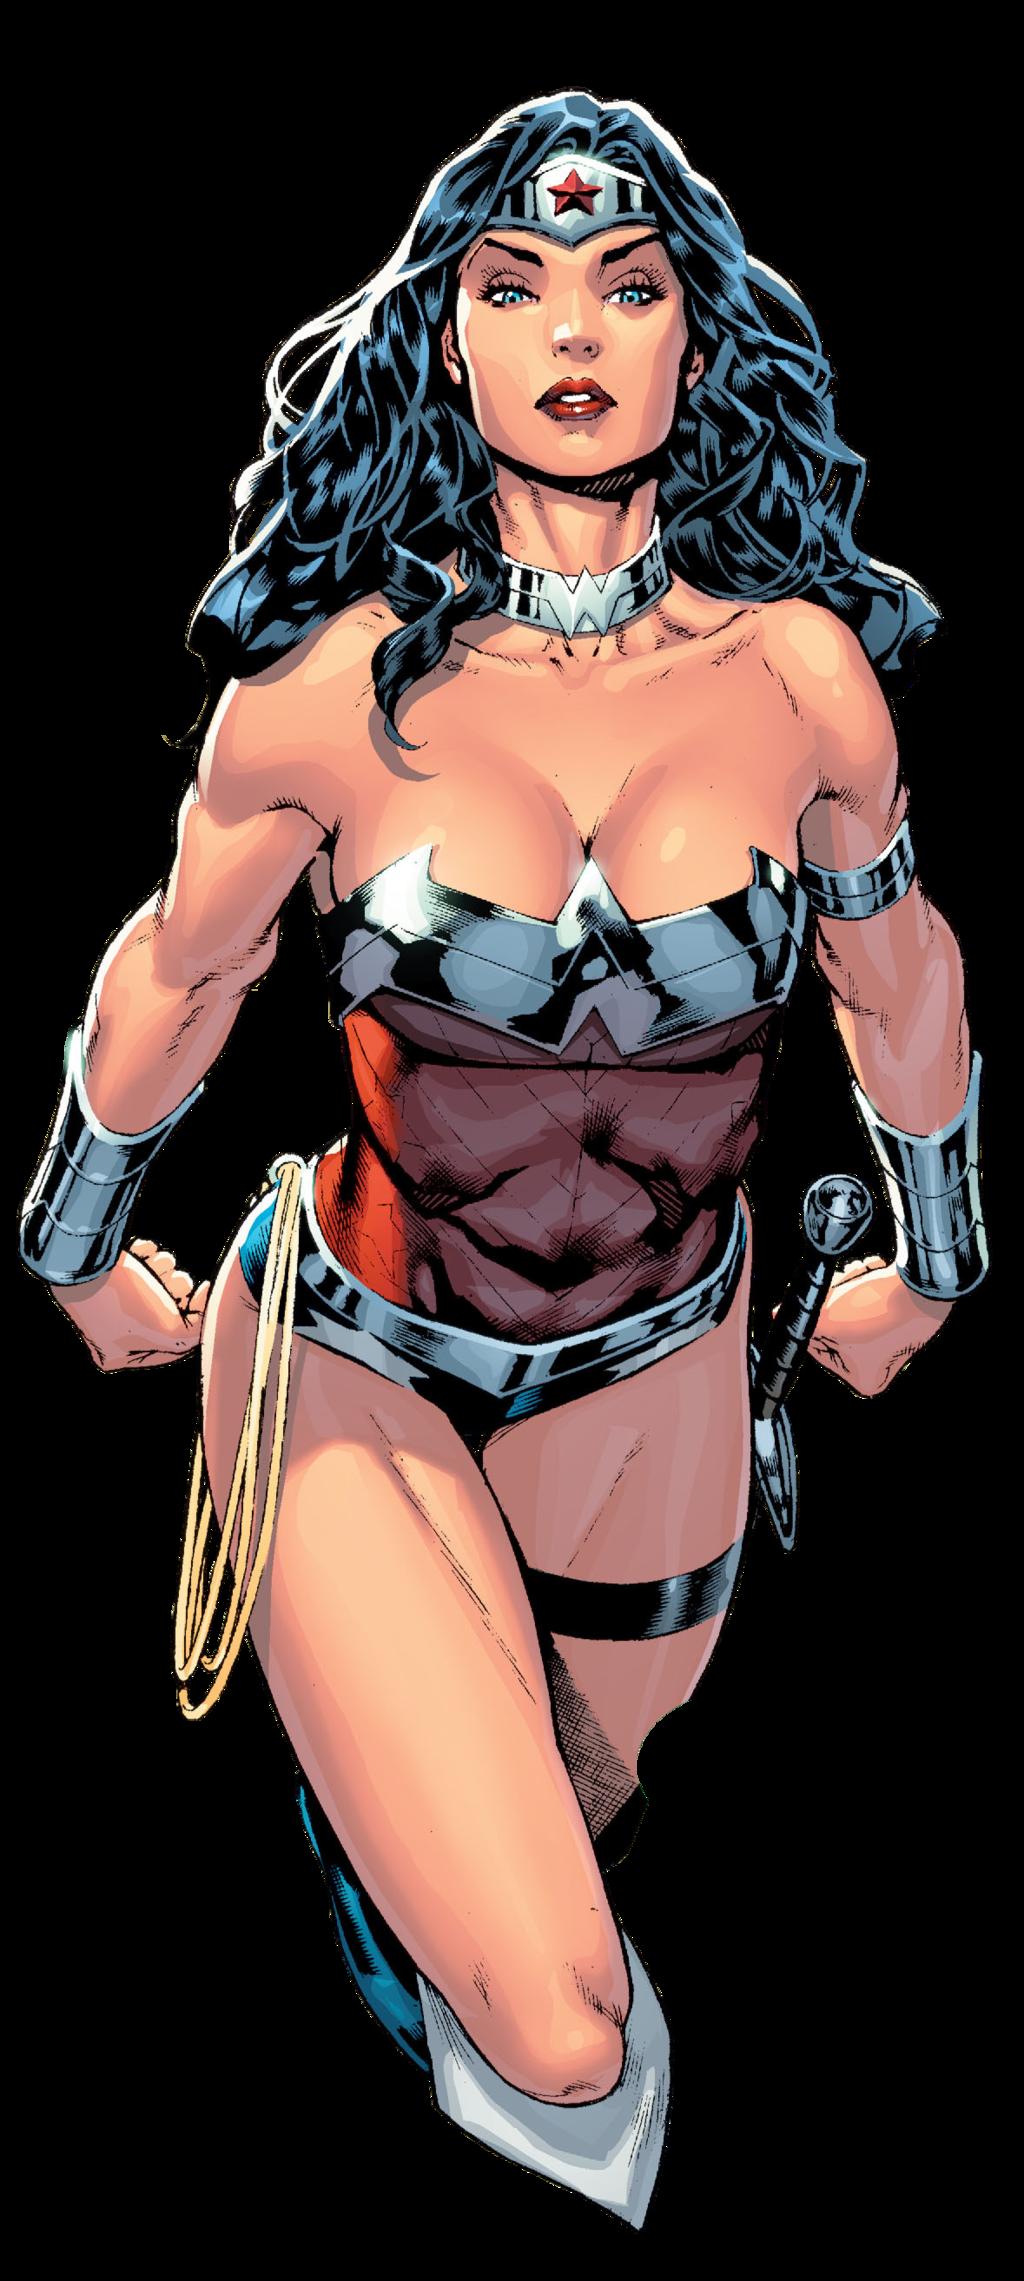 Wonder Woman Render By Lysianthus D8s7qxo Png 1024 2281 Wonder Woman Comic Wonder Woman Wonder Woman Art